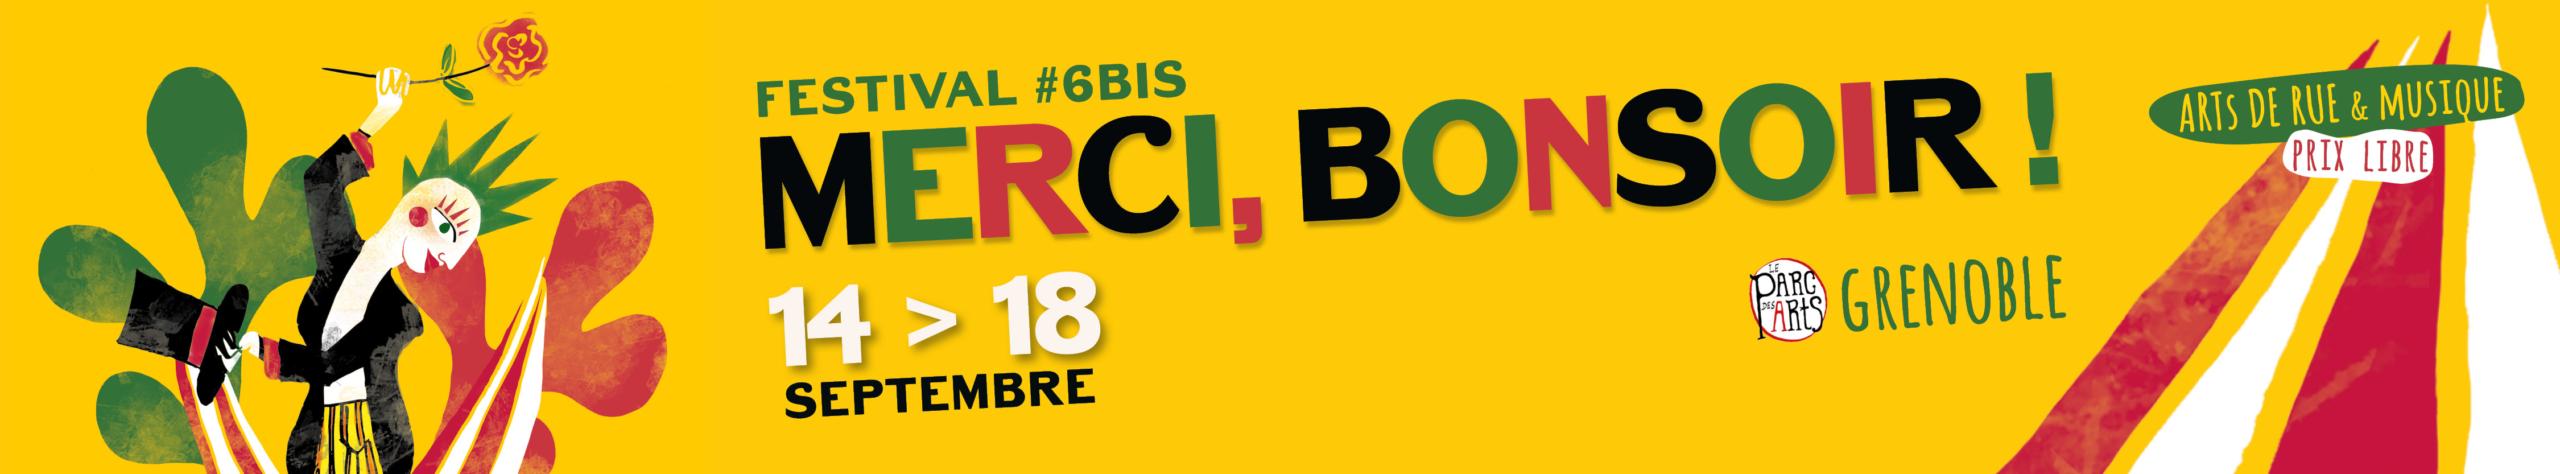 Festival « Merci, Bonsoir ! » #6bis / Mix'Arts / Grenoble